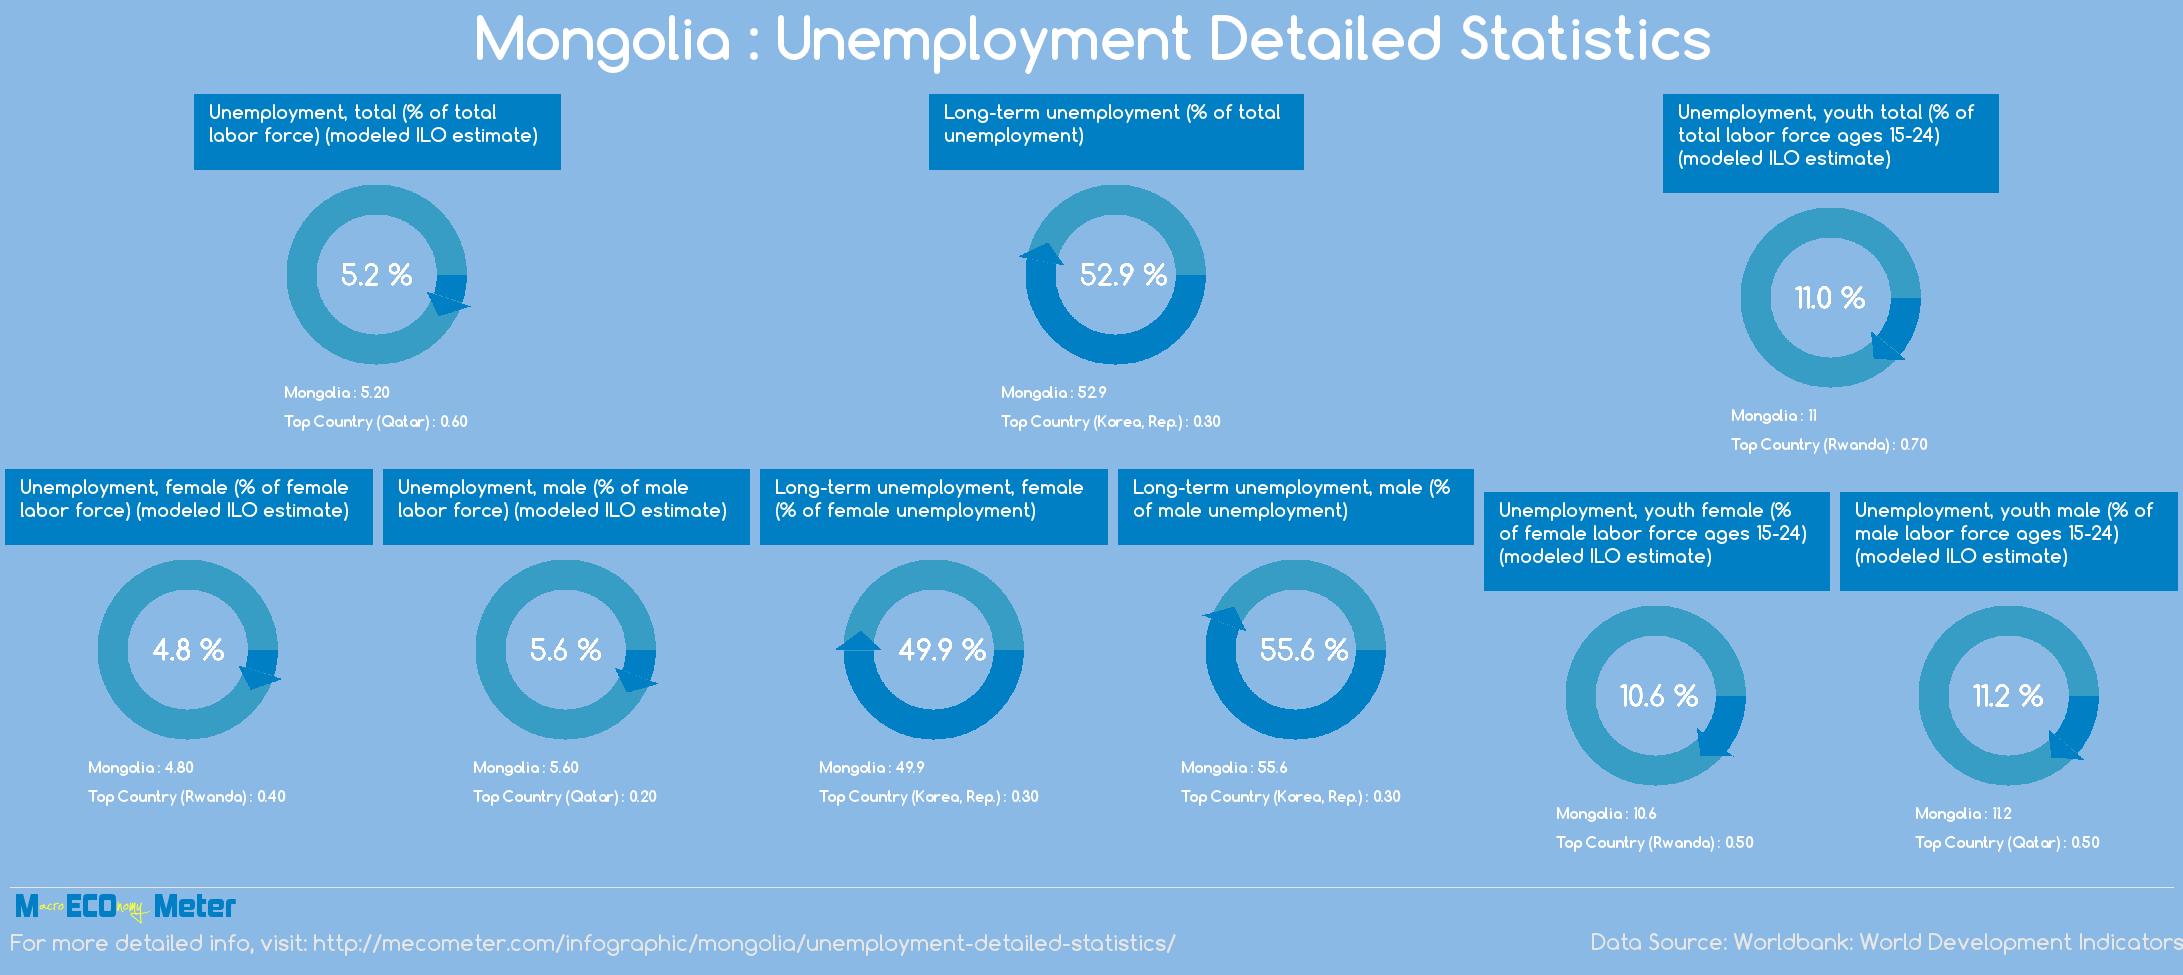 Mongolia : Unemployment Detailed Statistics